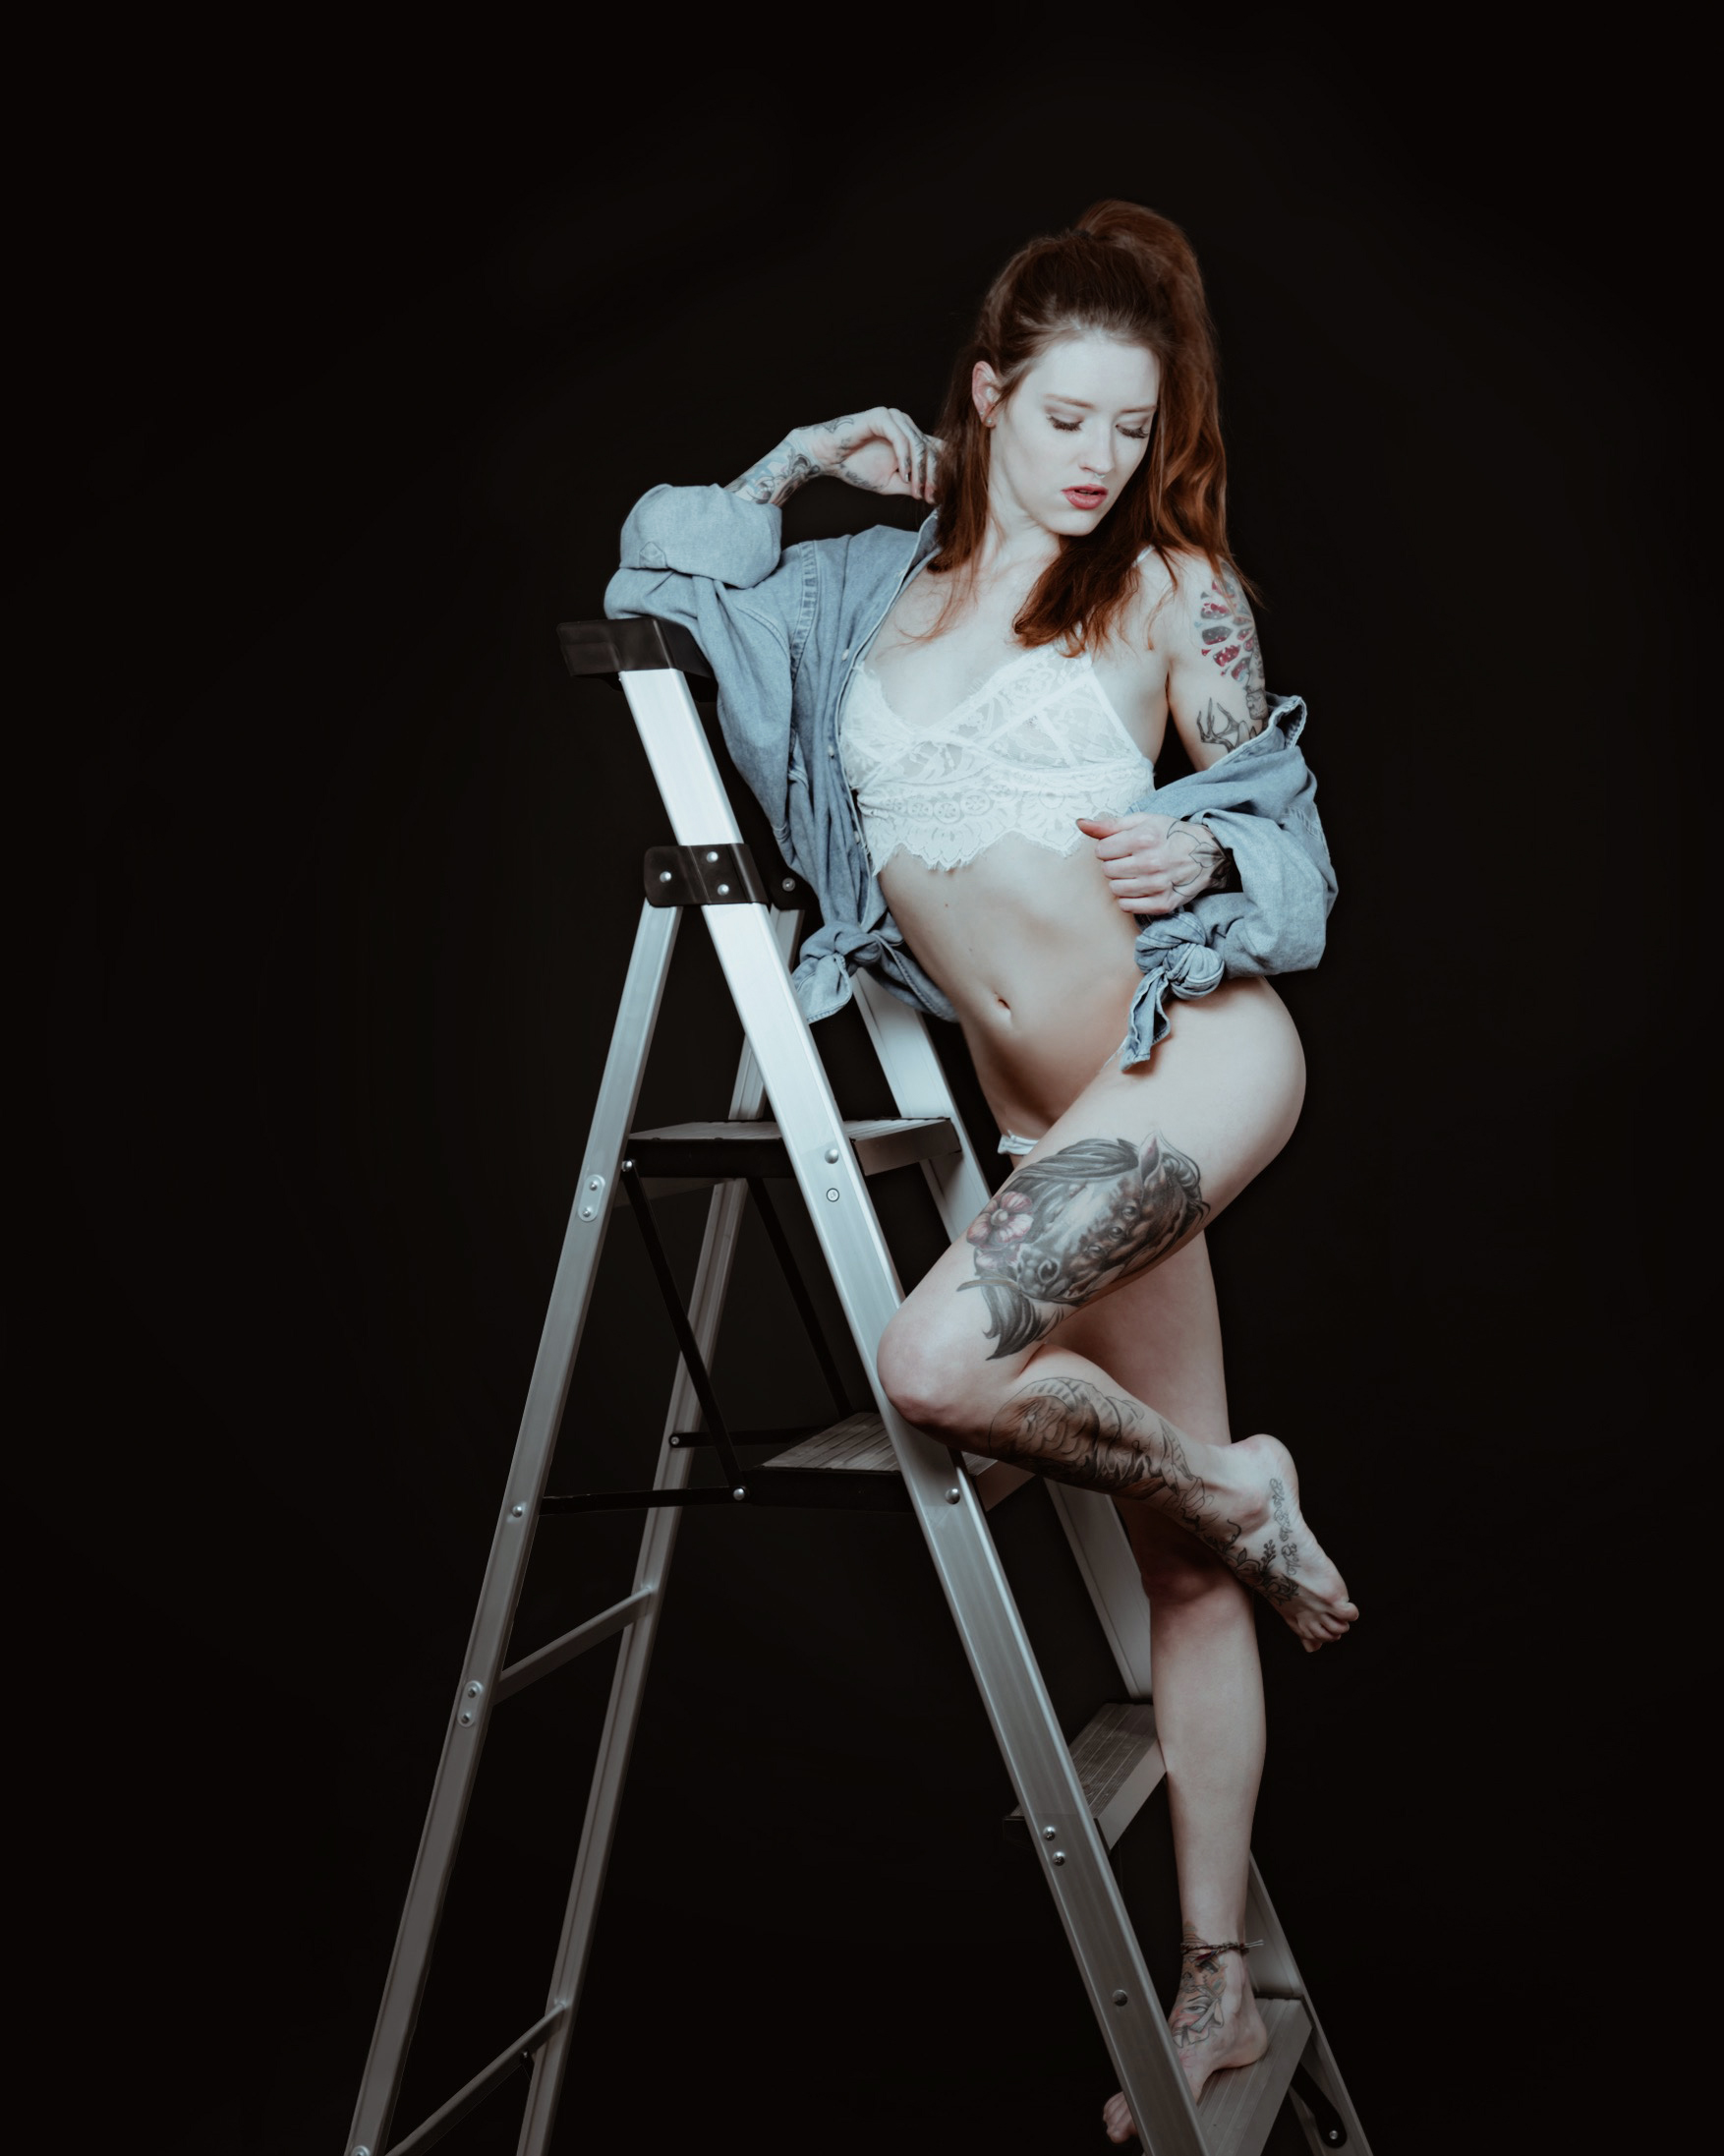 SavannahKinney-WhiteMoth-Studio-Sweater+Denim-05.JPG